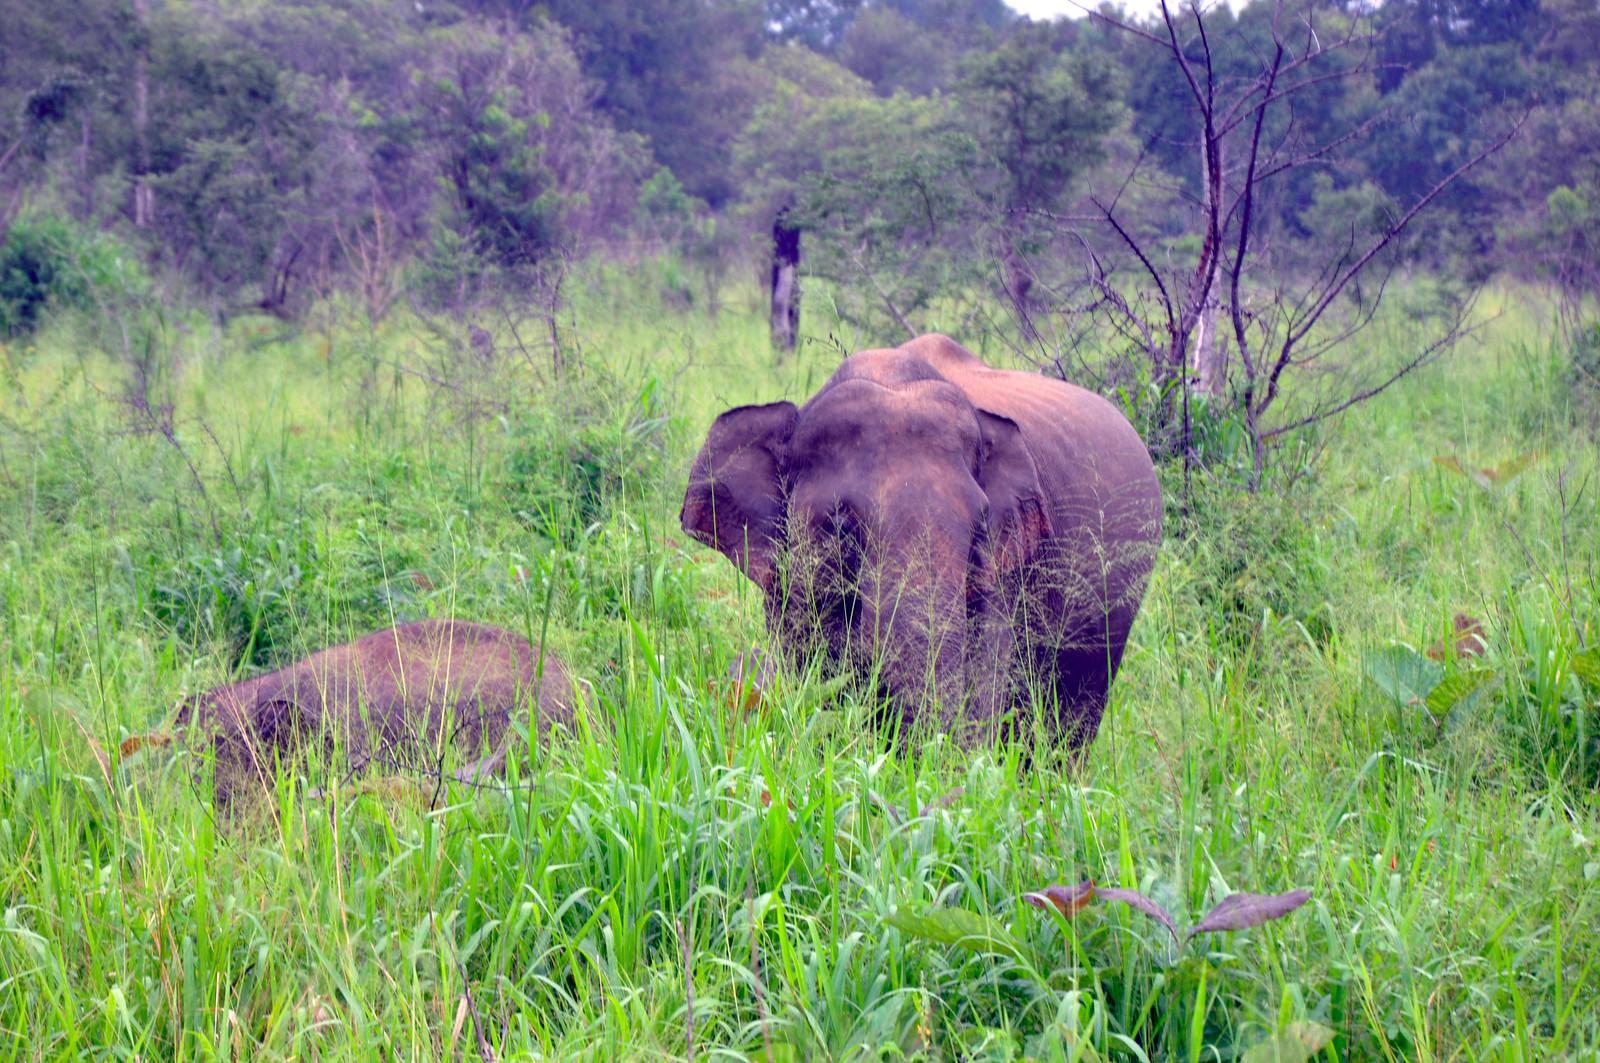 VER ELEFANTES SALVAJES EN SRI LANKA ver elefantes salvajes en sri lanka - 40009433523 29e8e9229e h - Ver elefantes salvajes en Sri Lanka